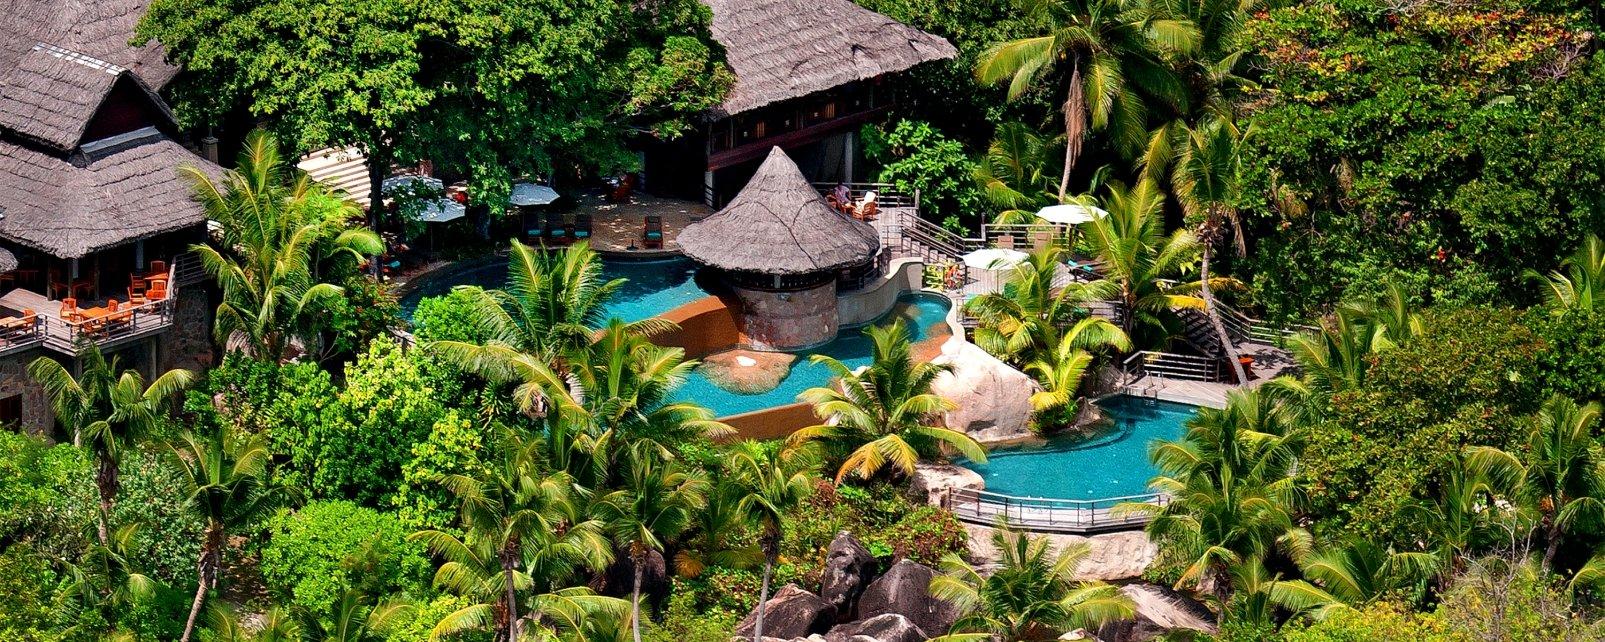 Booking Hotel Seychelles